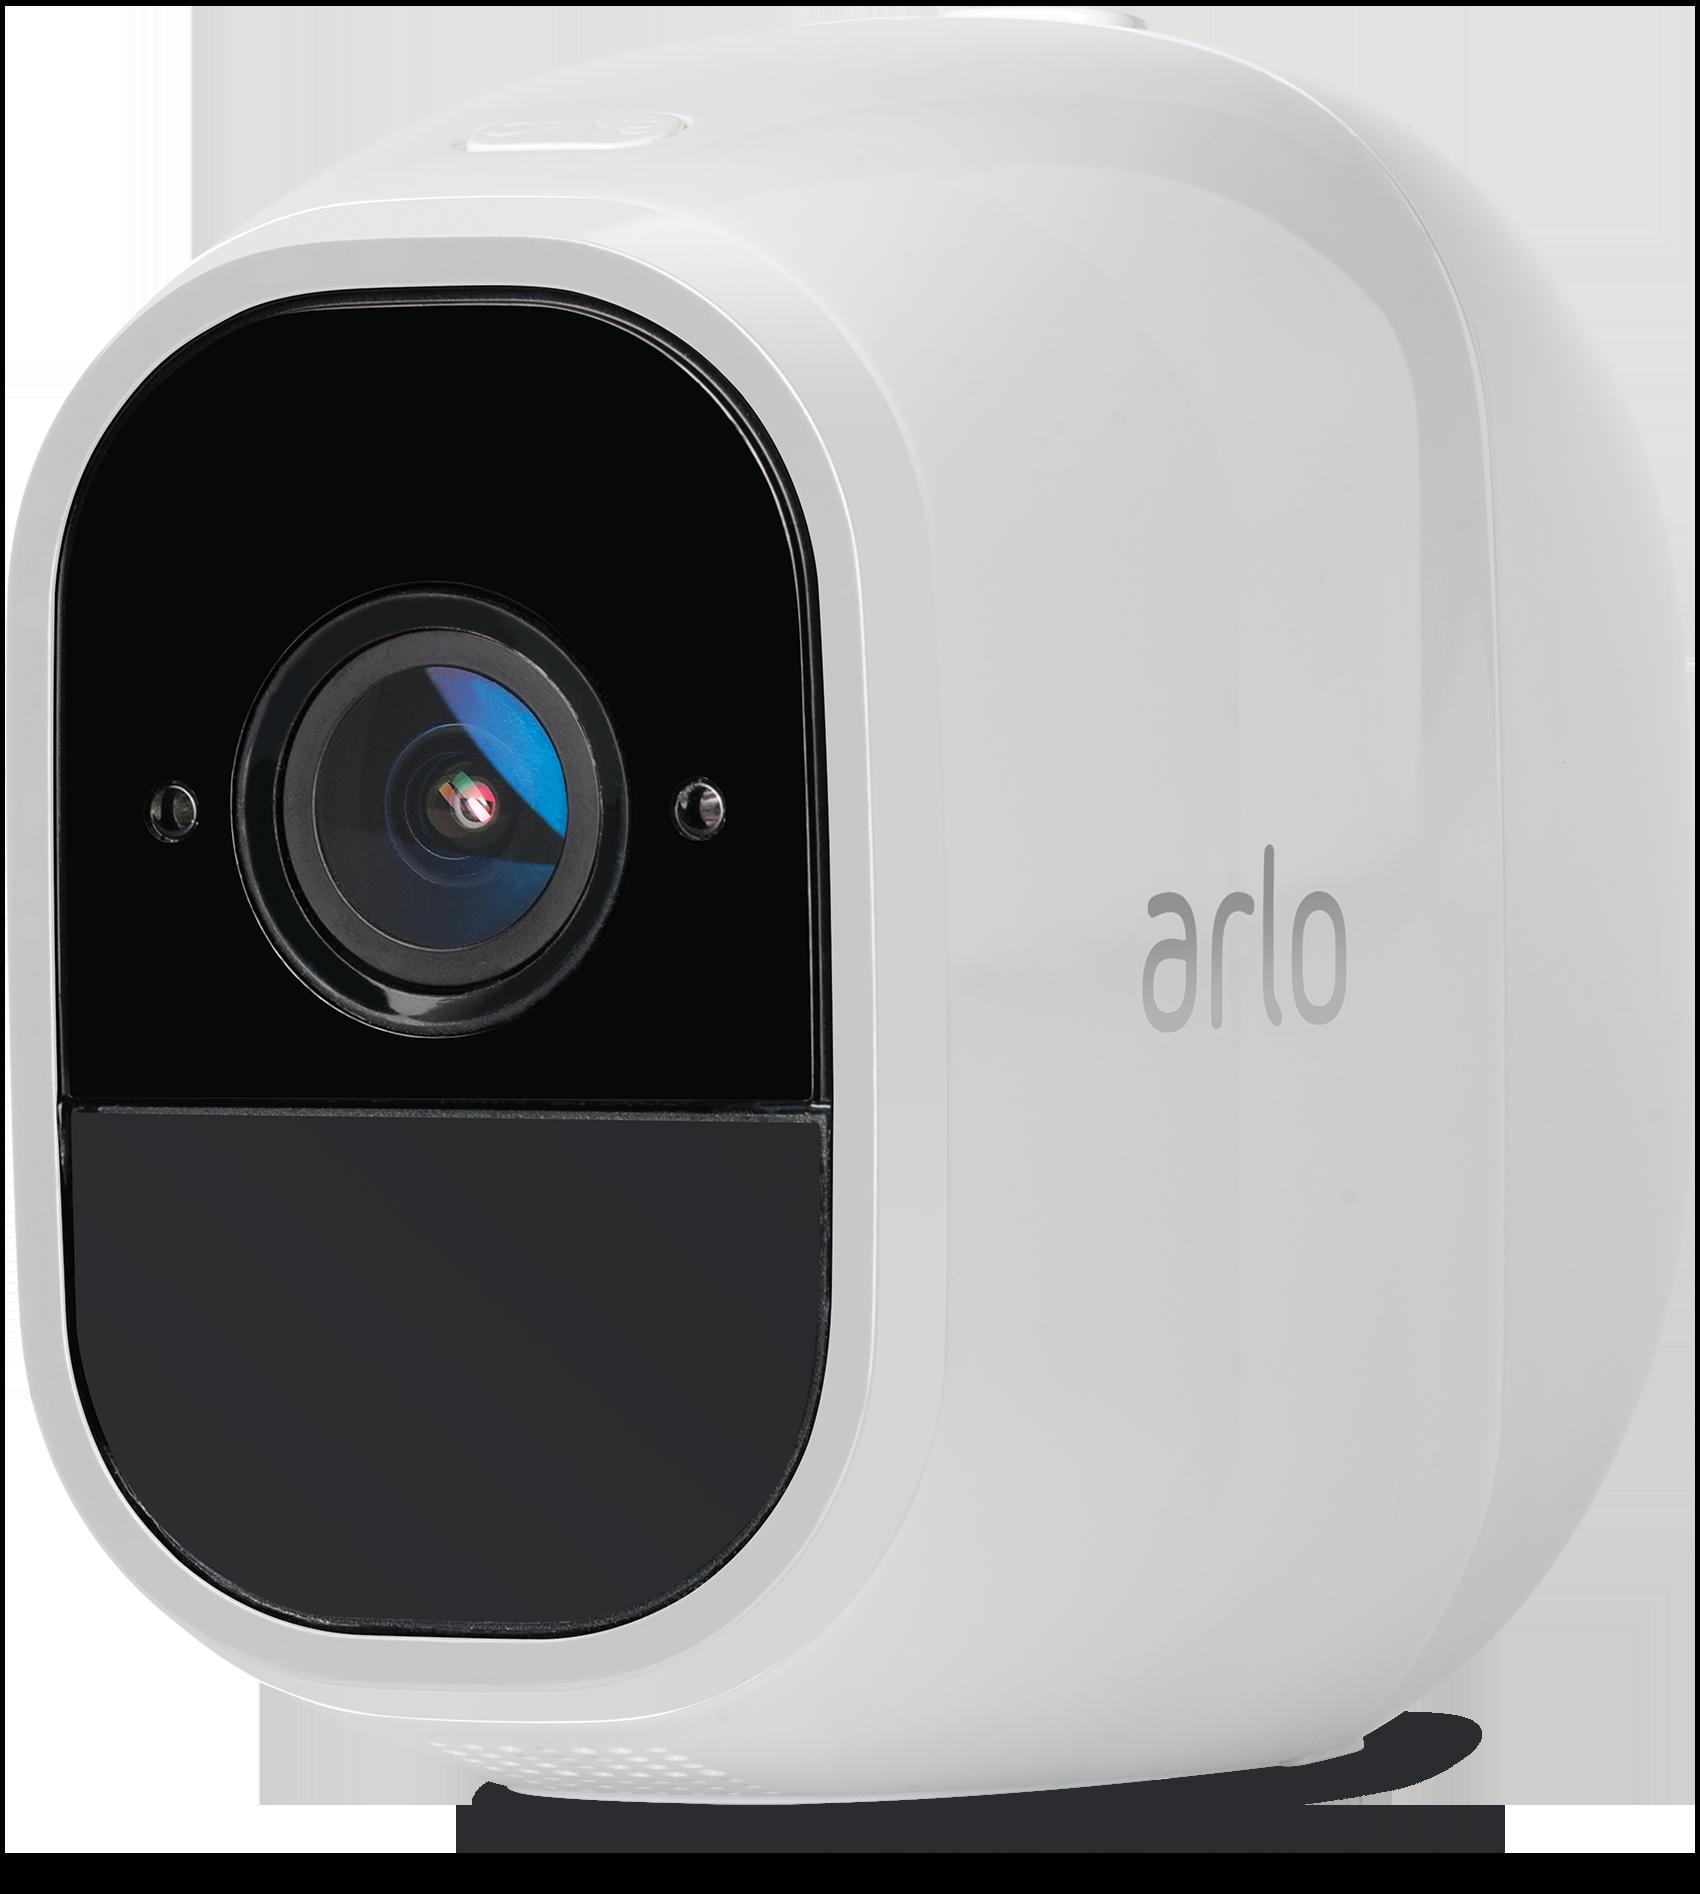 Arlo Audio Doorbell Wiring Diagram For Plus Two Pro 2 Cameras Vmk4250p